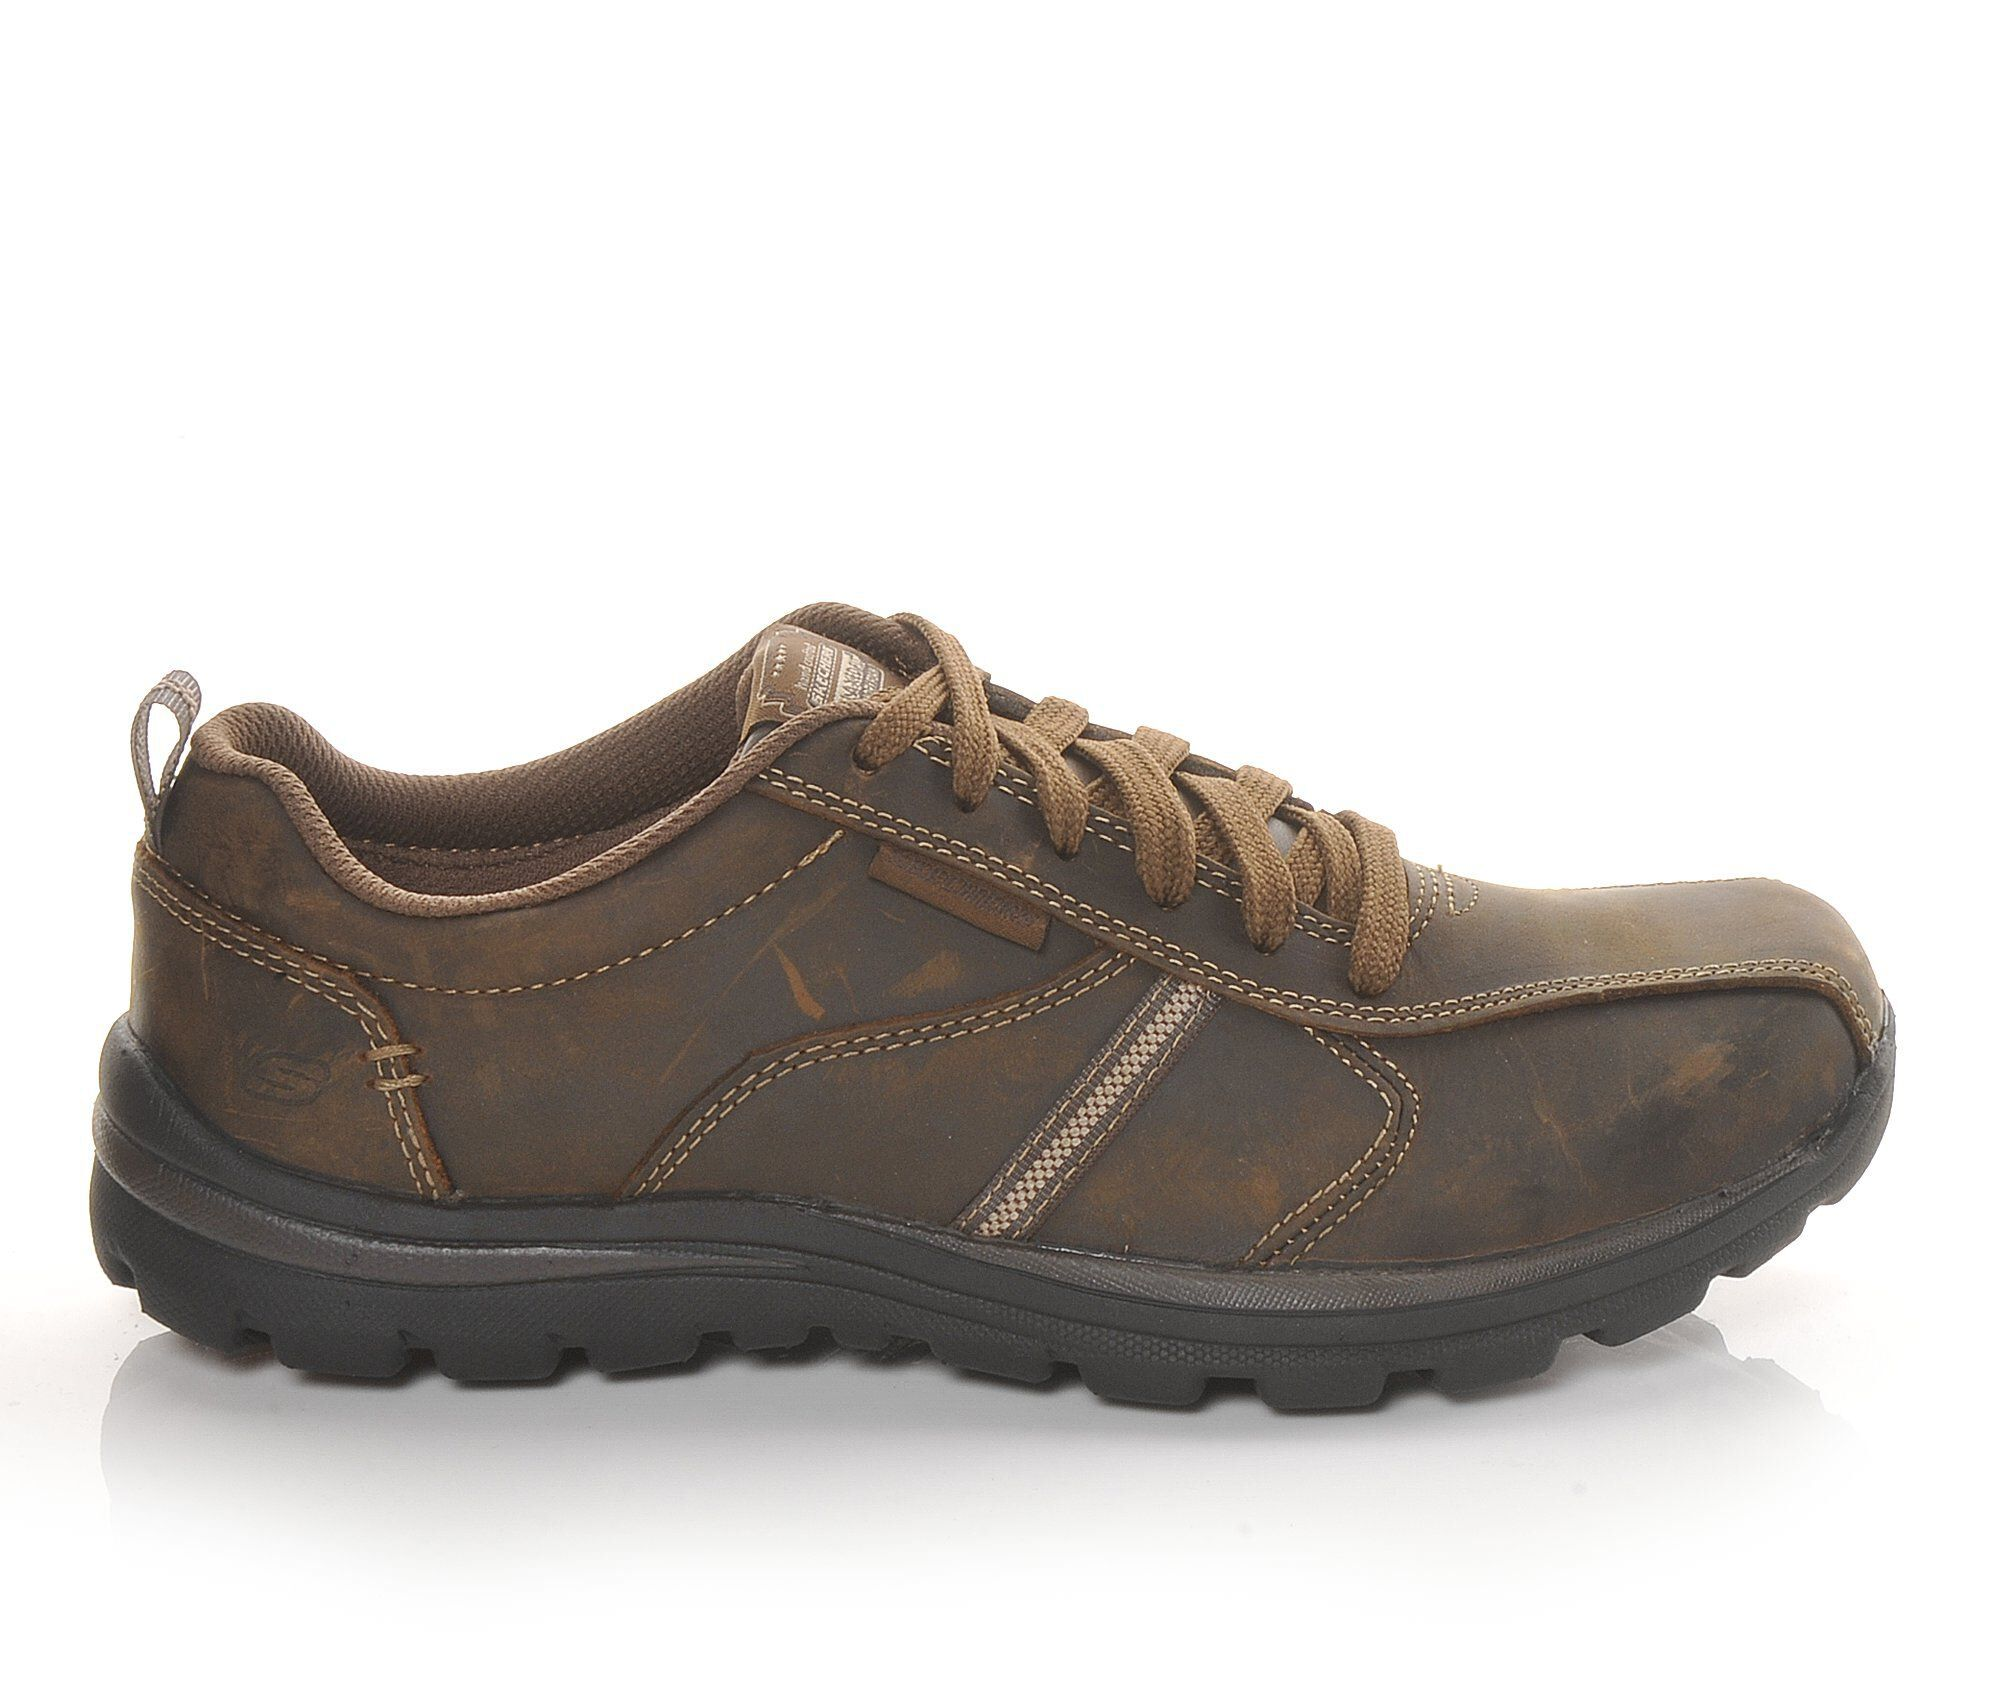 cheap best store to get Men's Skechers Levoy 64224 Oxfords supply classic for sale footlocker online buy cheap deals c0iDYhN